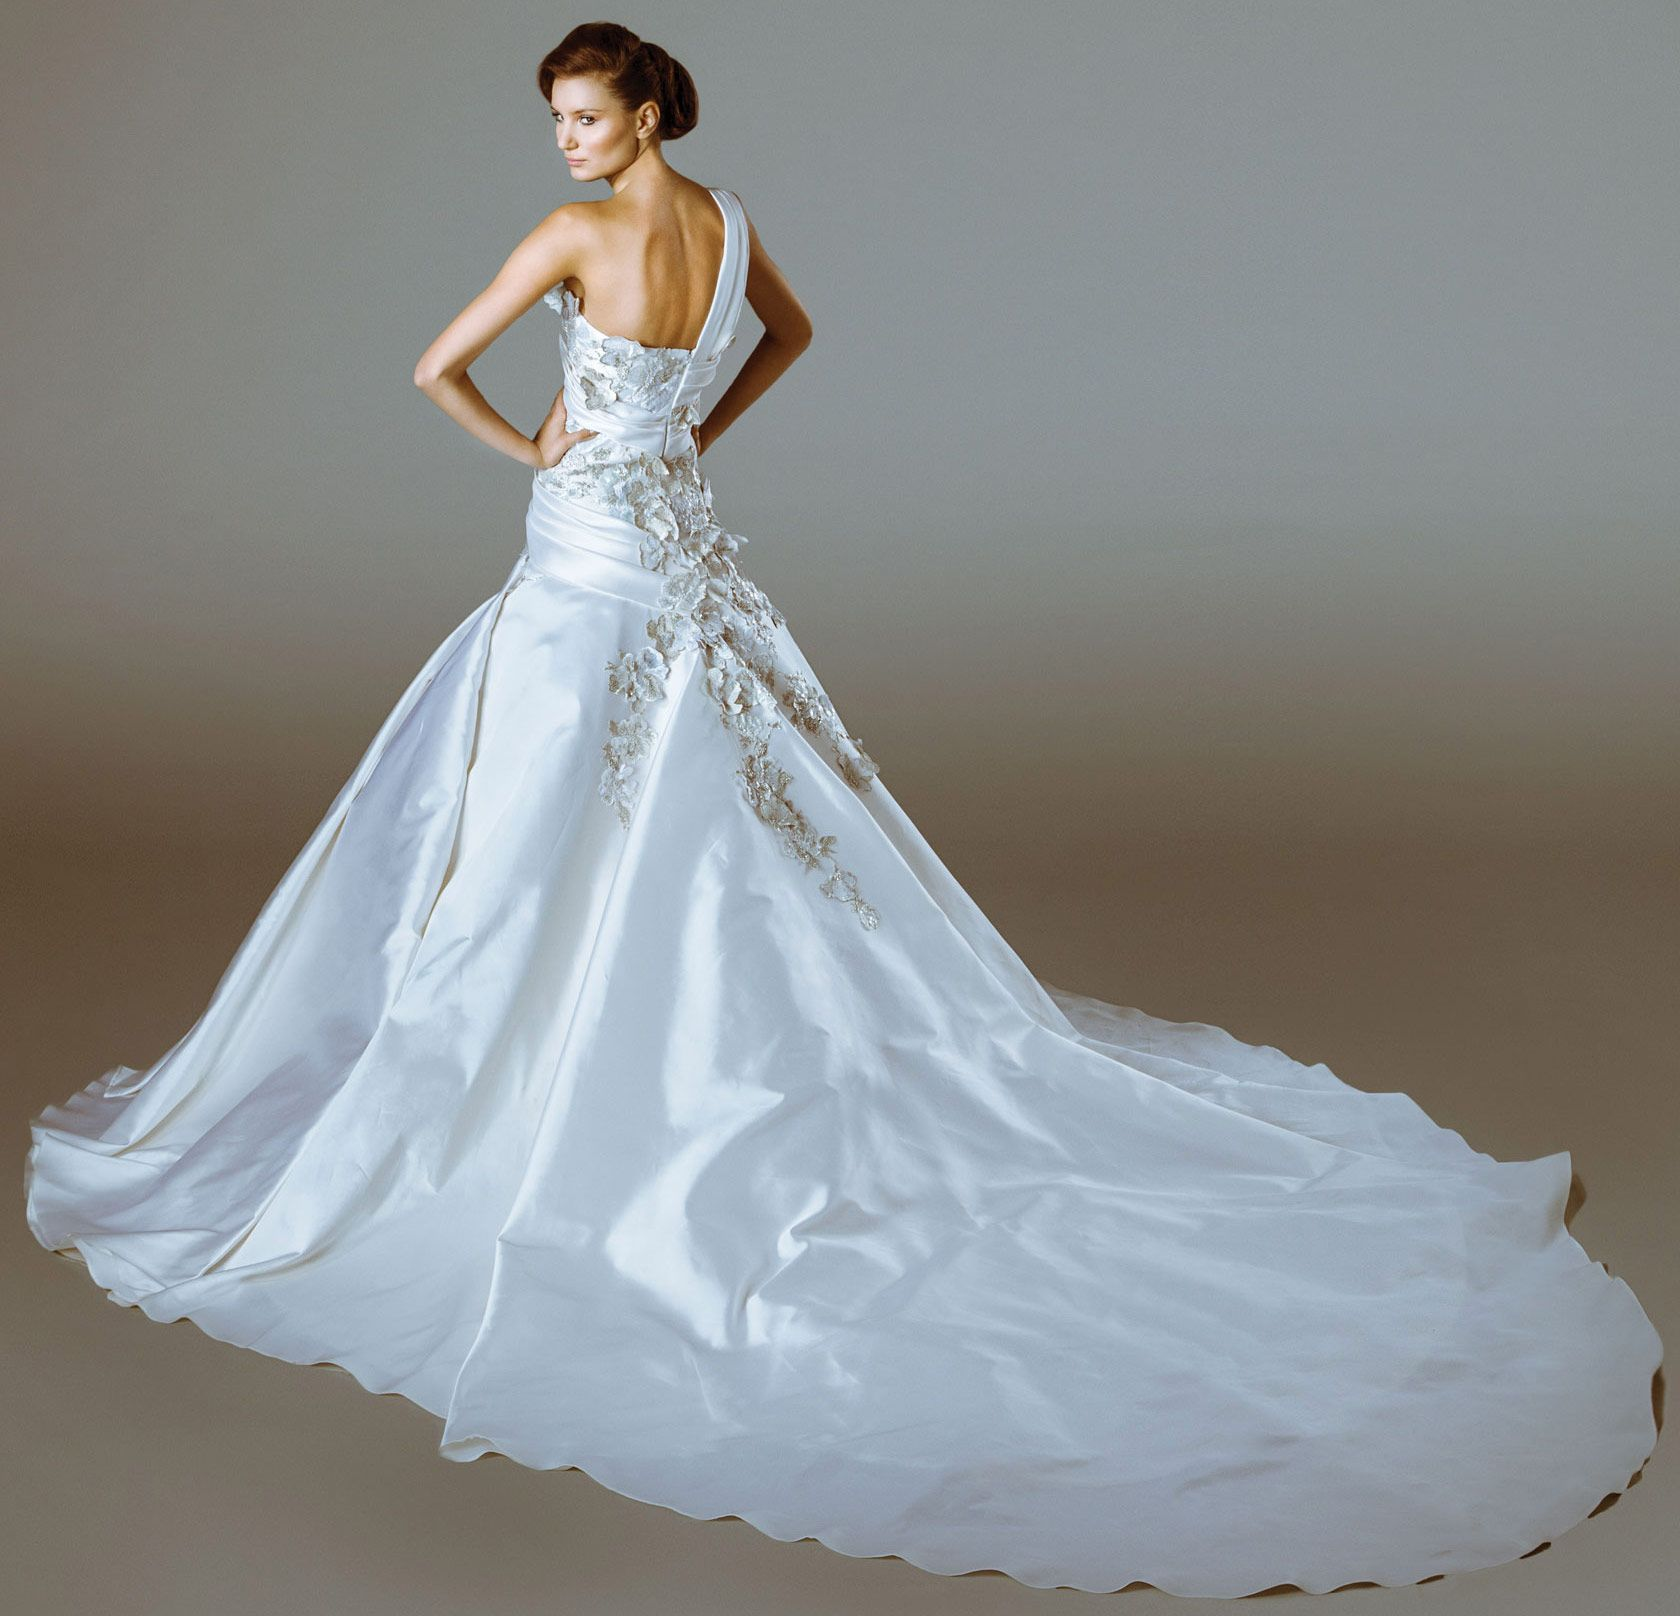 Rani Zakhem Wedding Dresses | Wedding dress, Weddings and Wedding